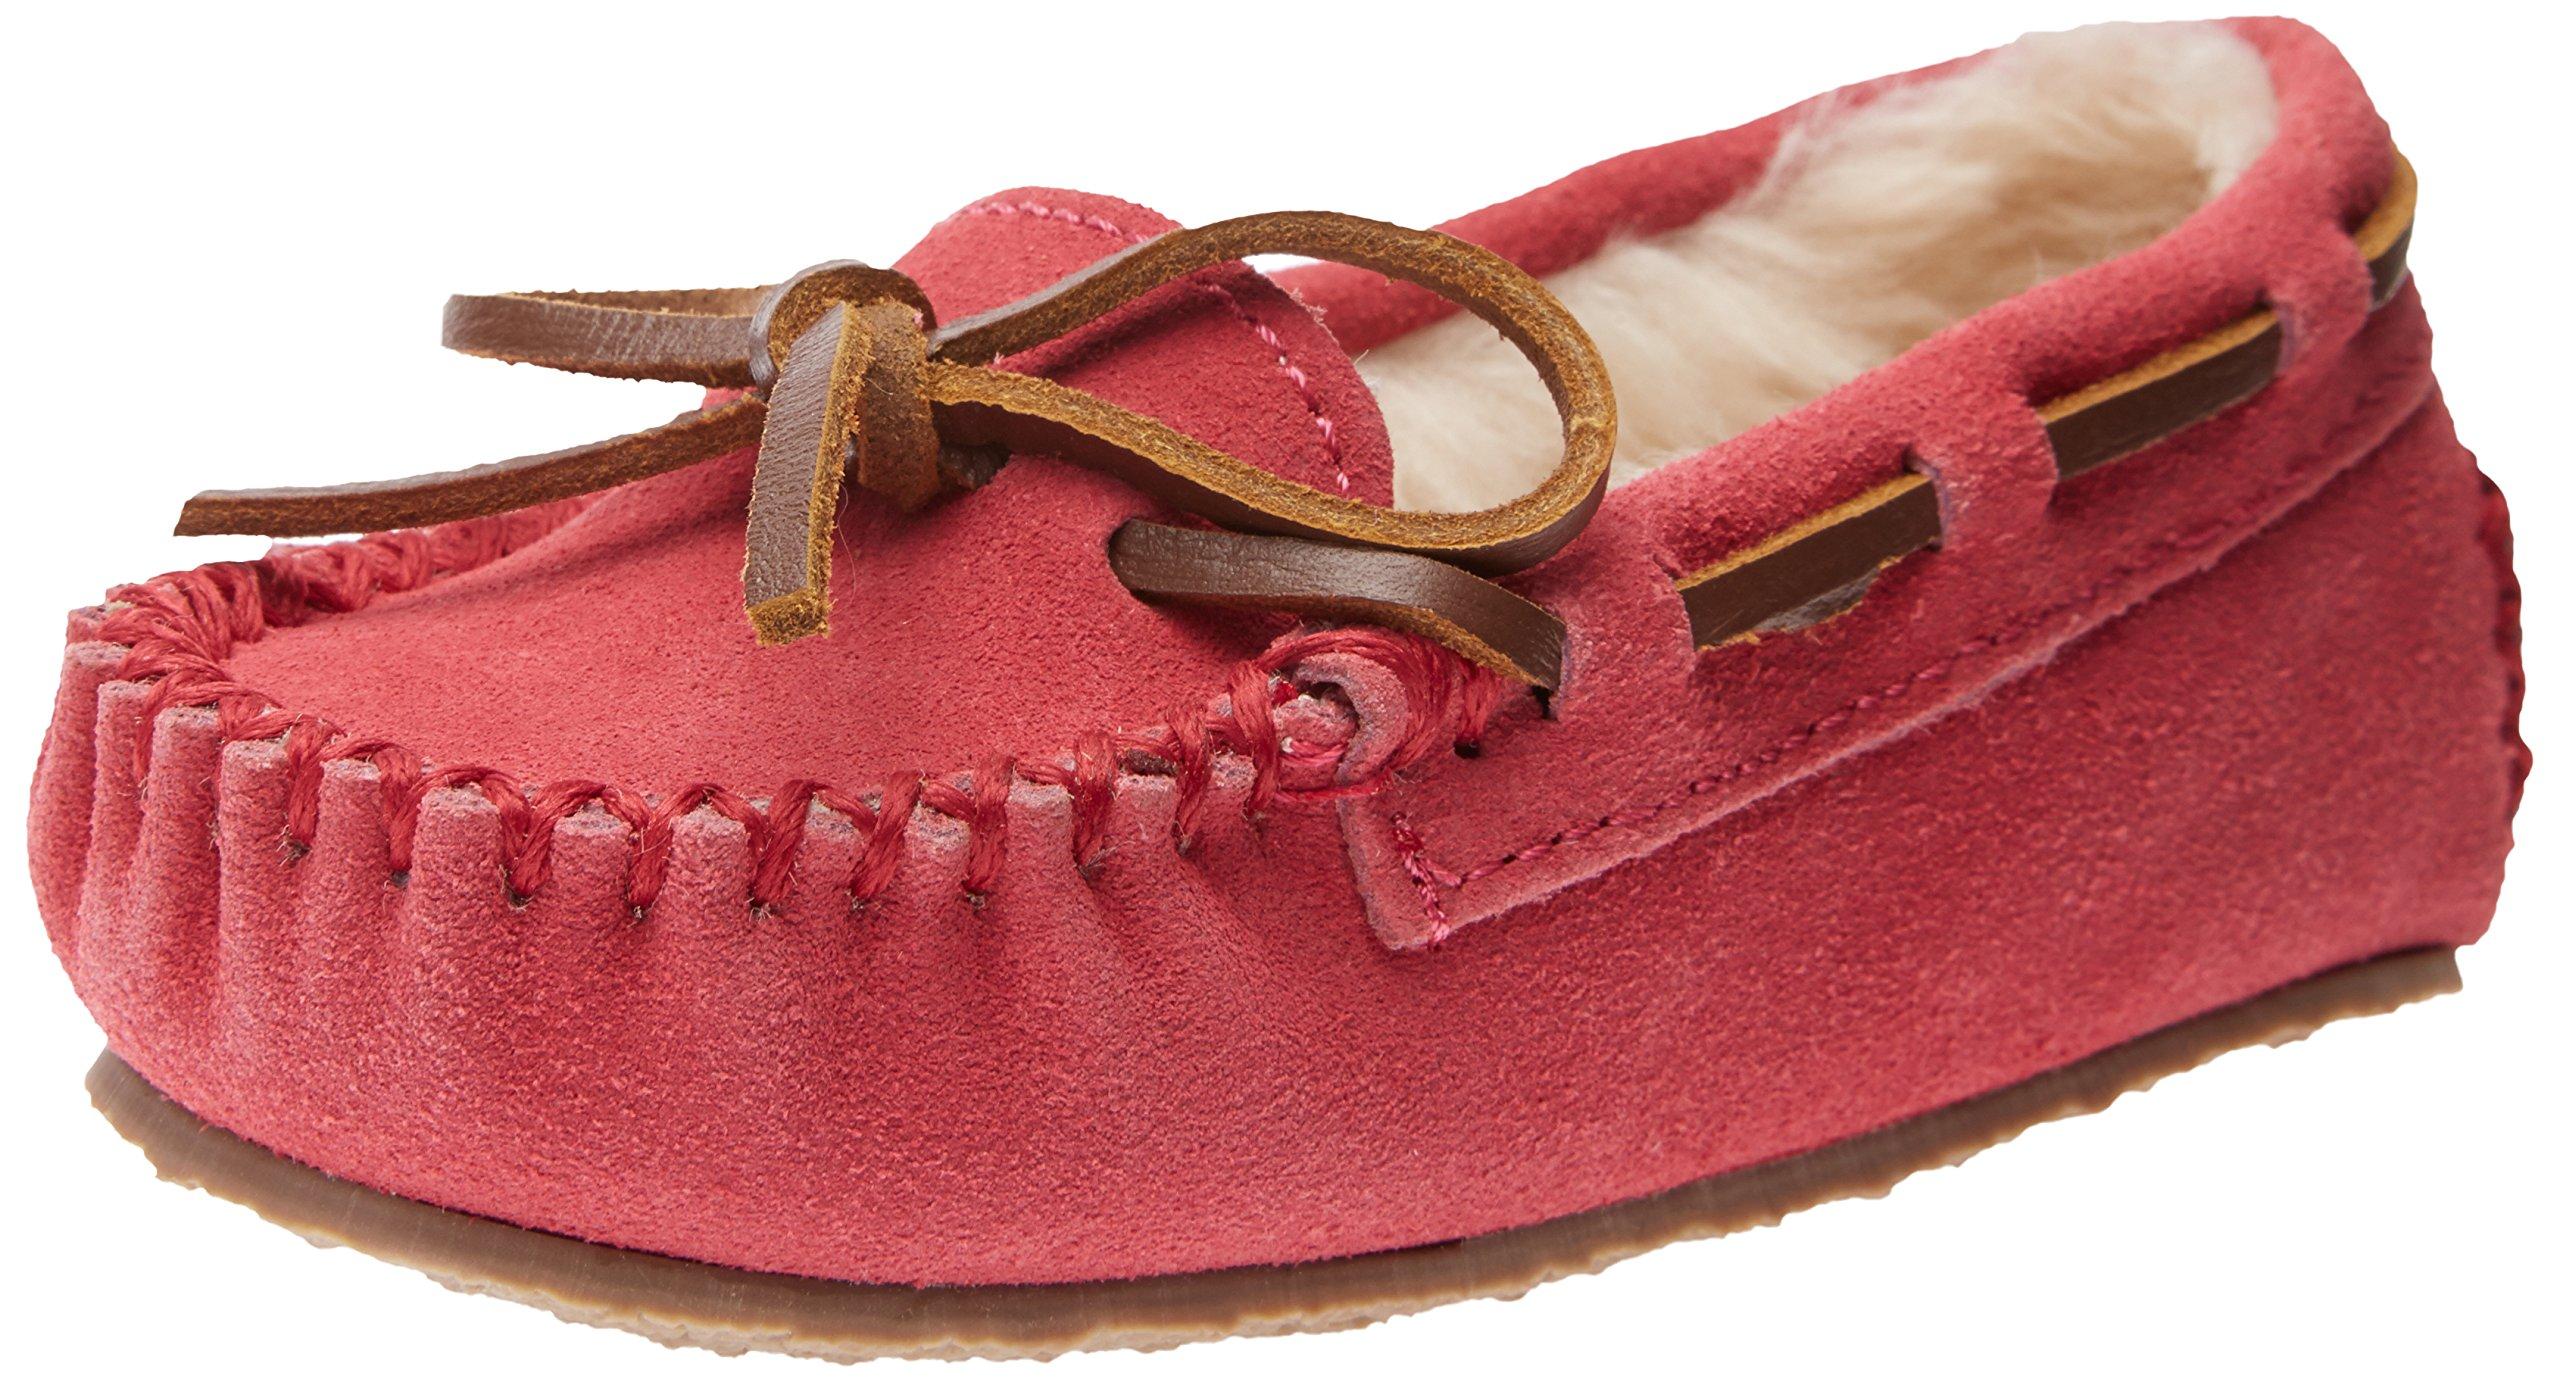 Minnetonka Cassie Slipper (Toddler/Little Kid/Big Kid),Hot Pink,10 M US Toddler by Minnetonka